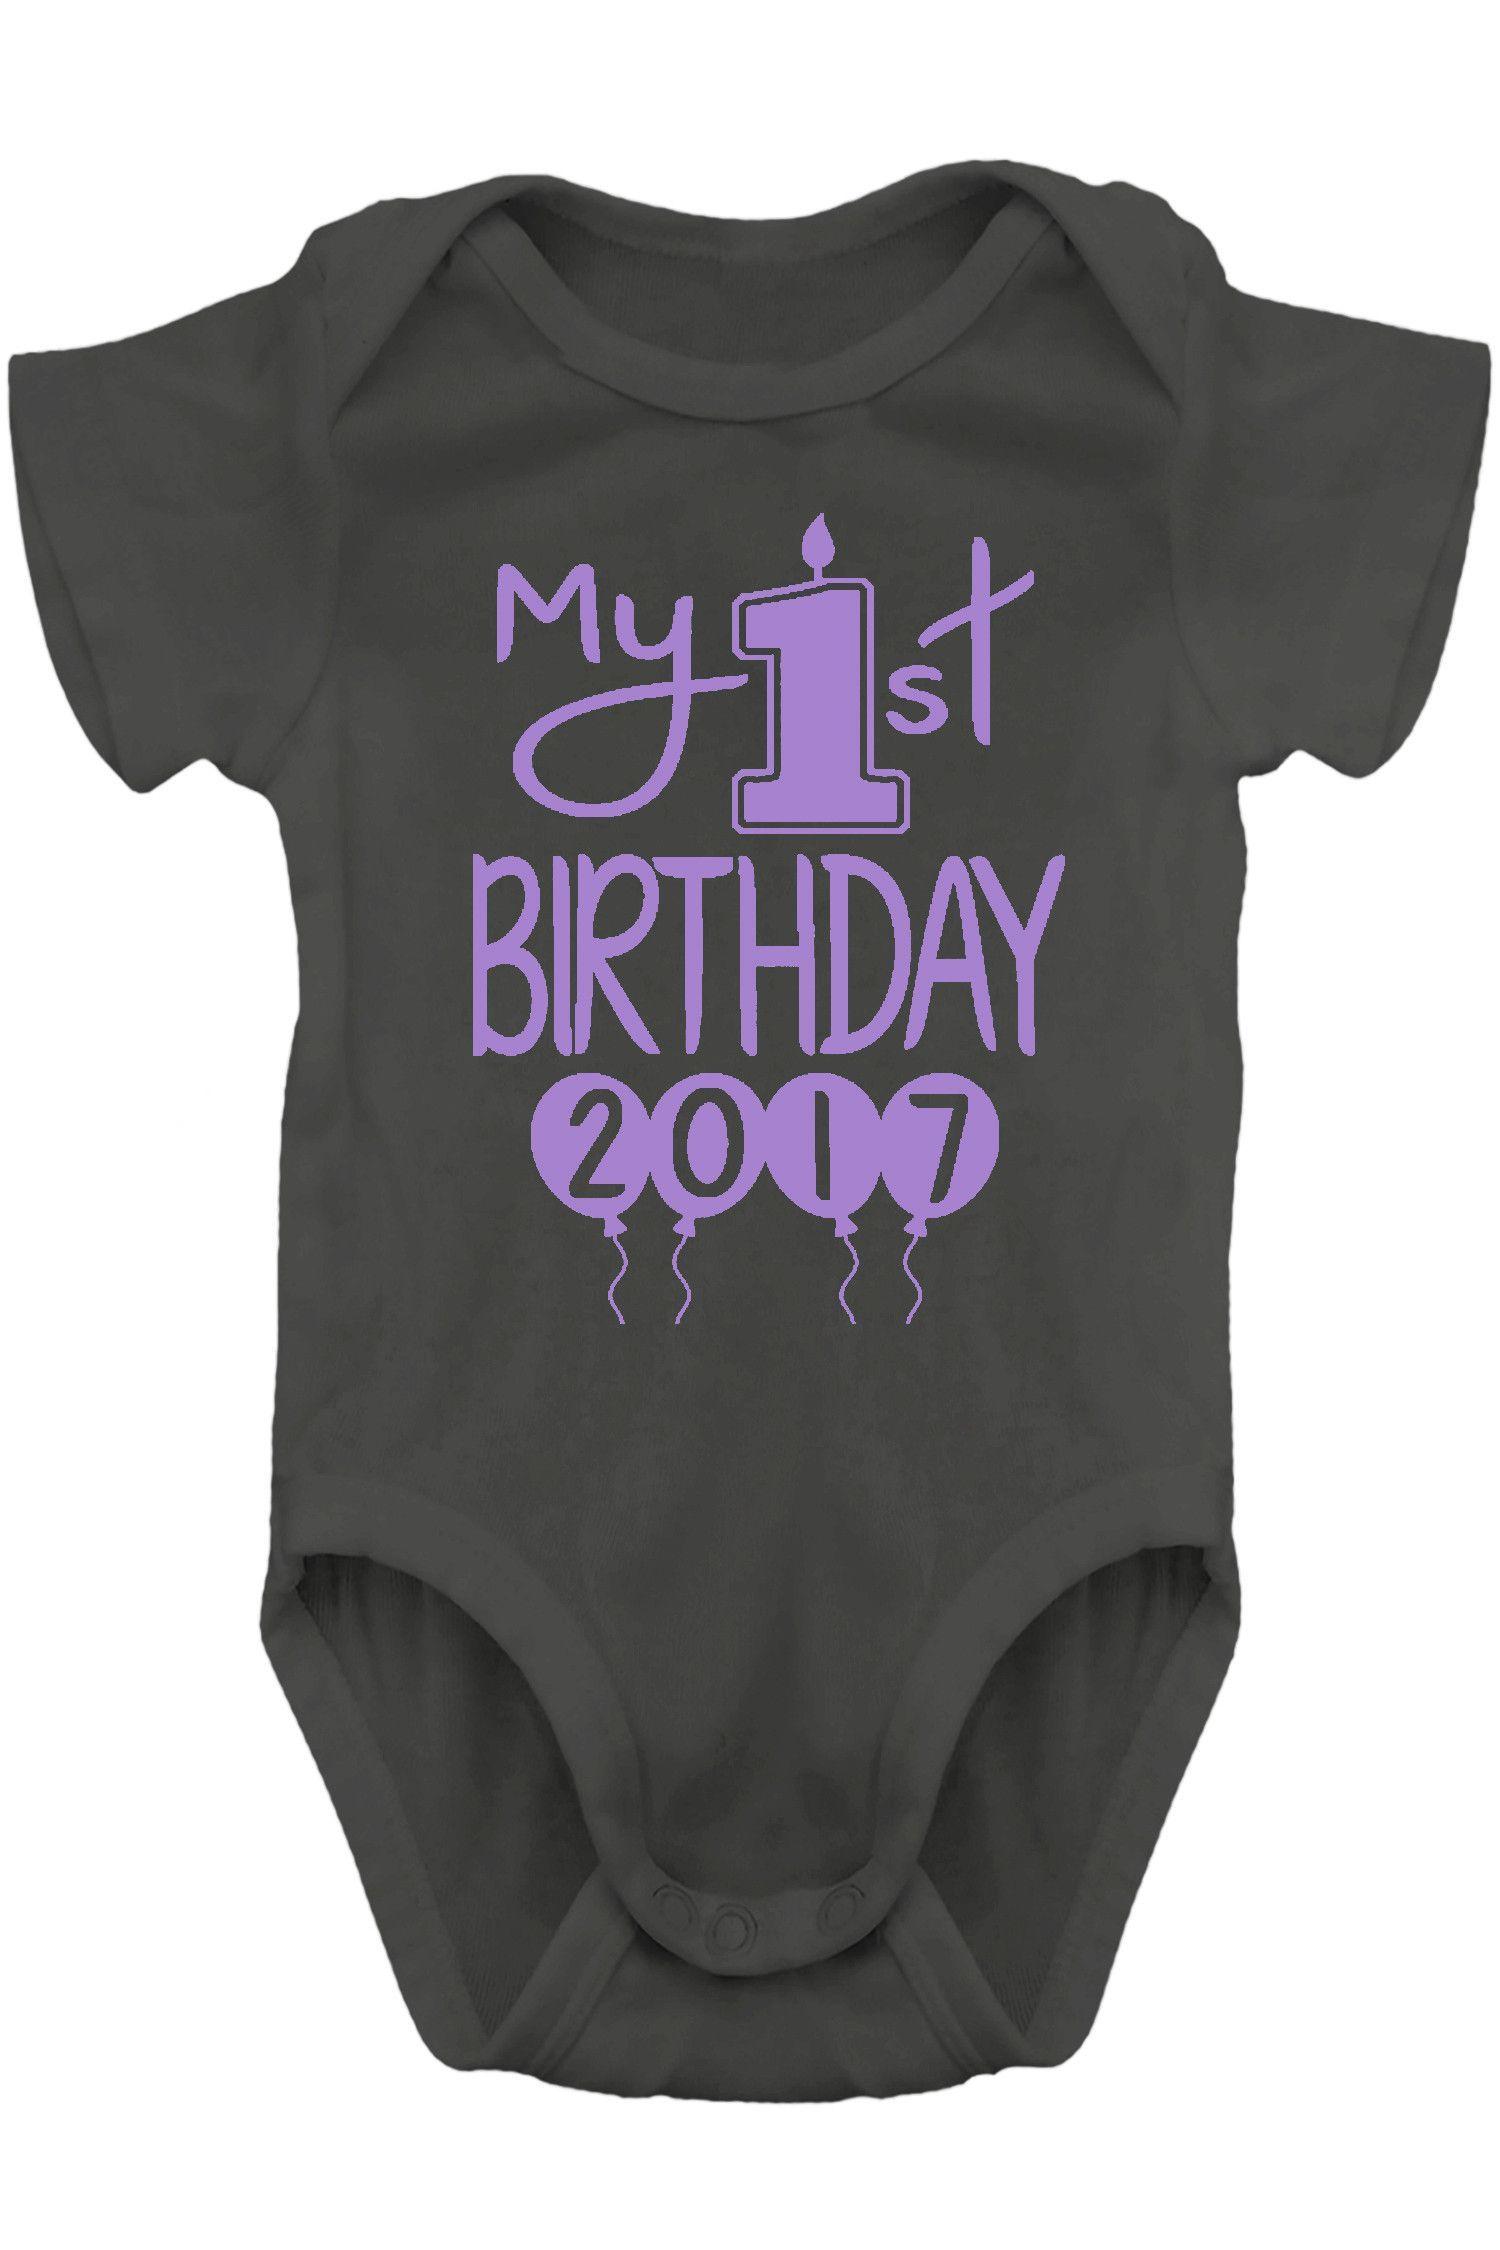 Baby Girl Clothes - My 1st Birthday Balloon Bodysuits